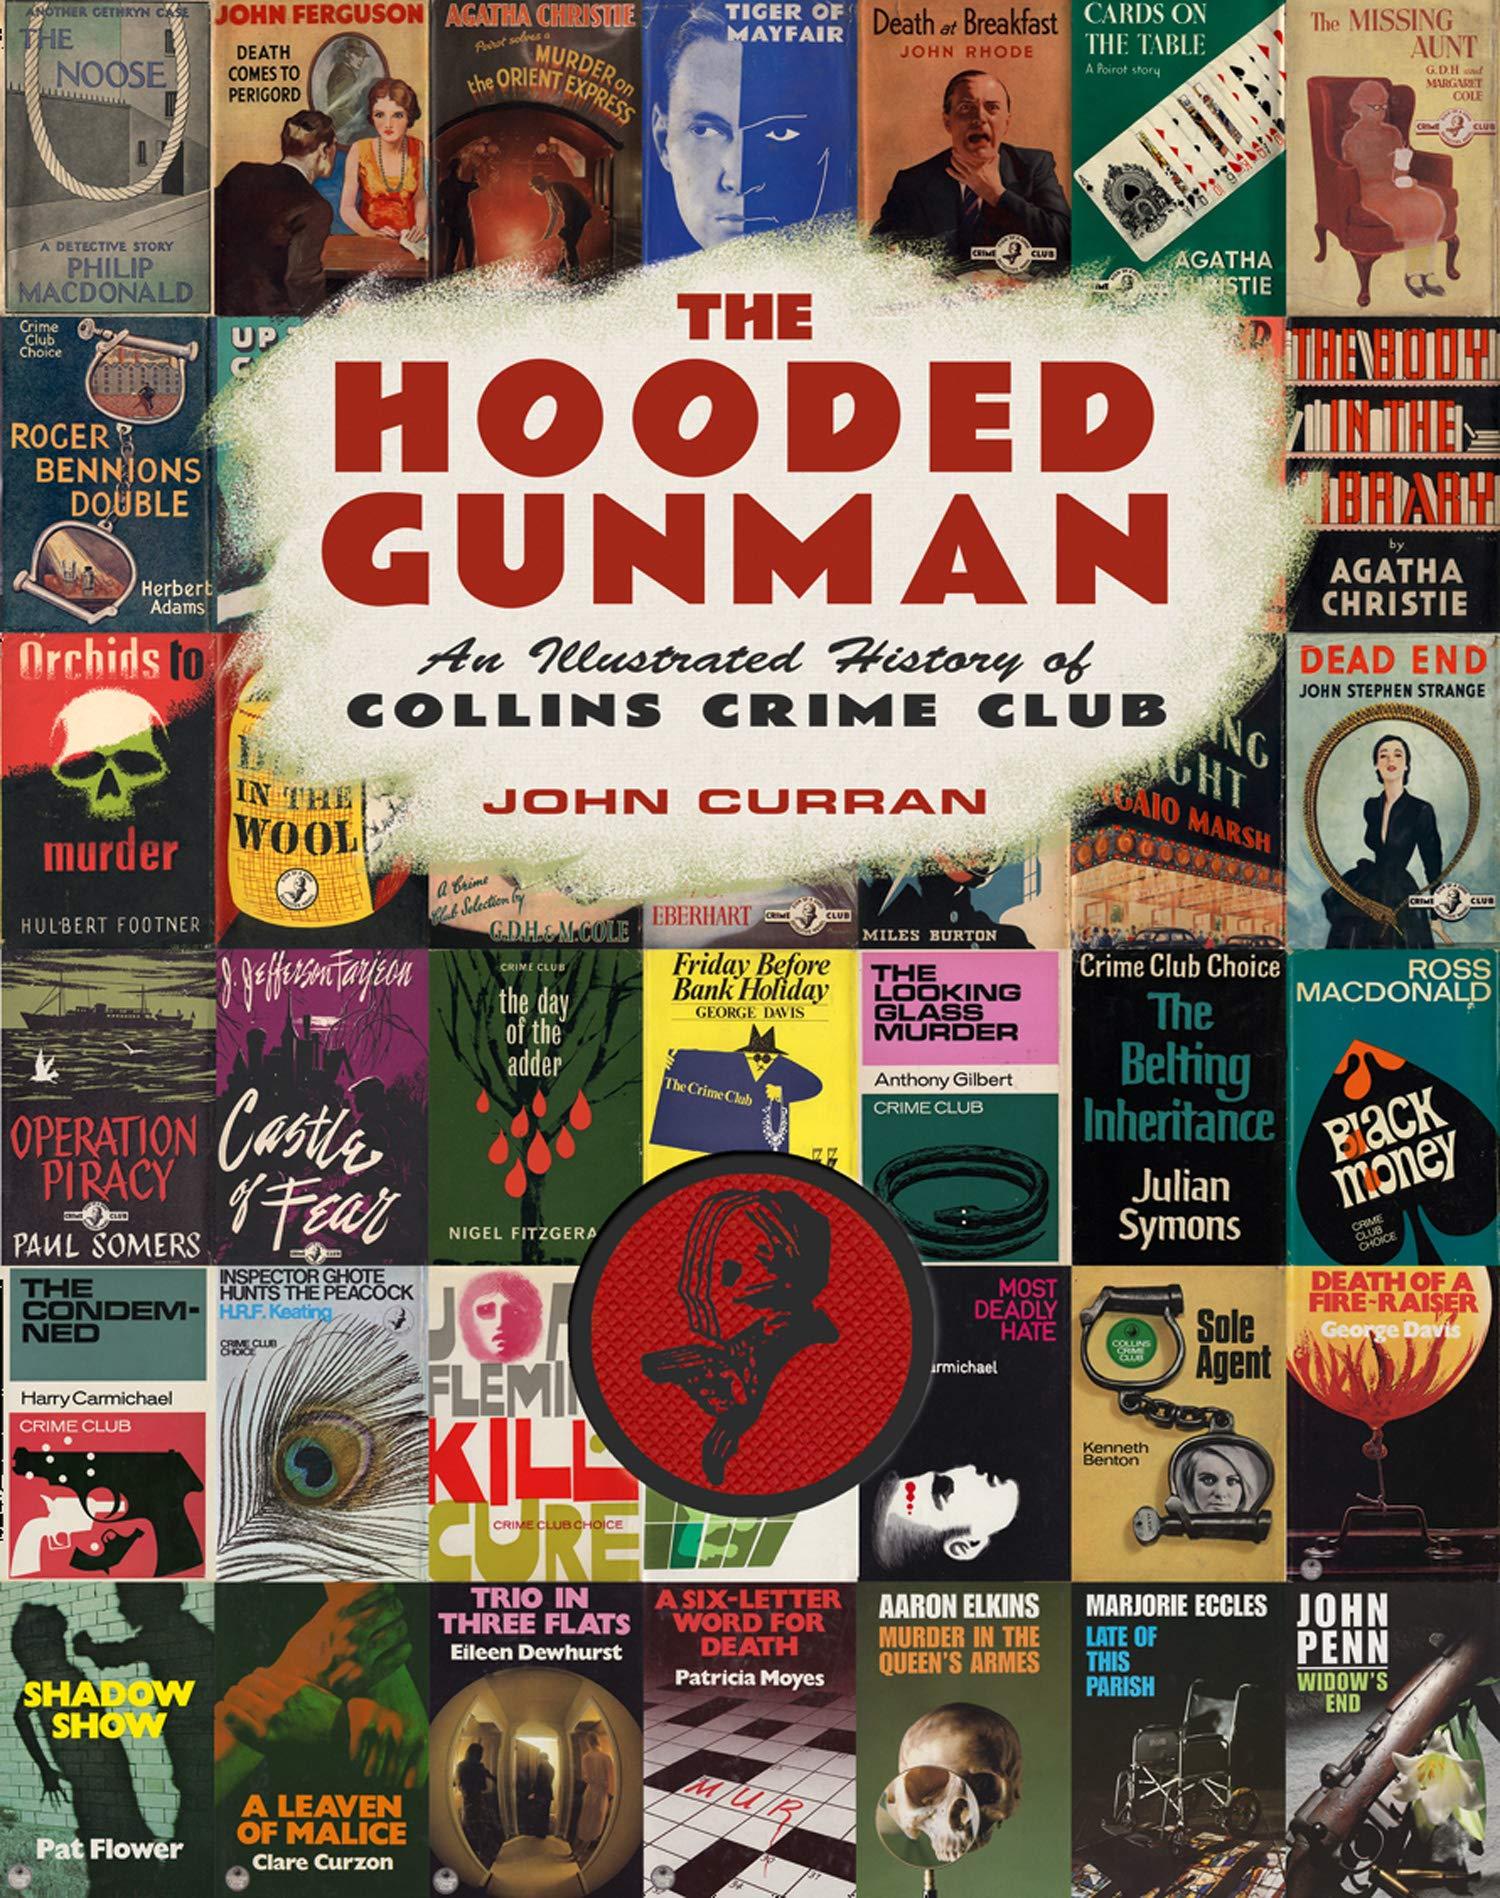 Hooded Gunman, The